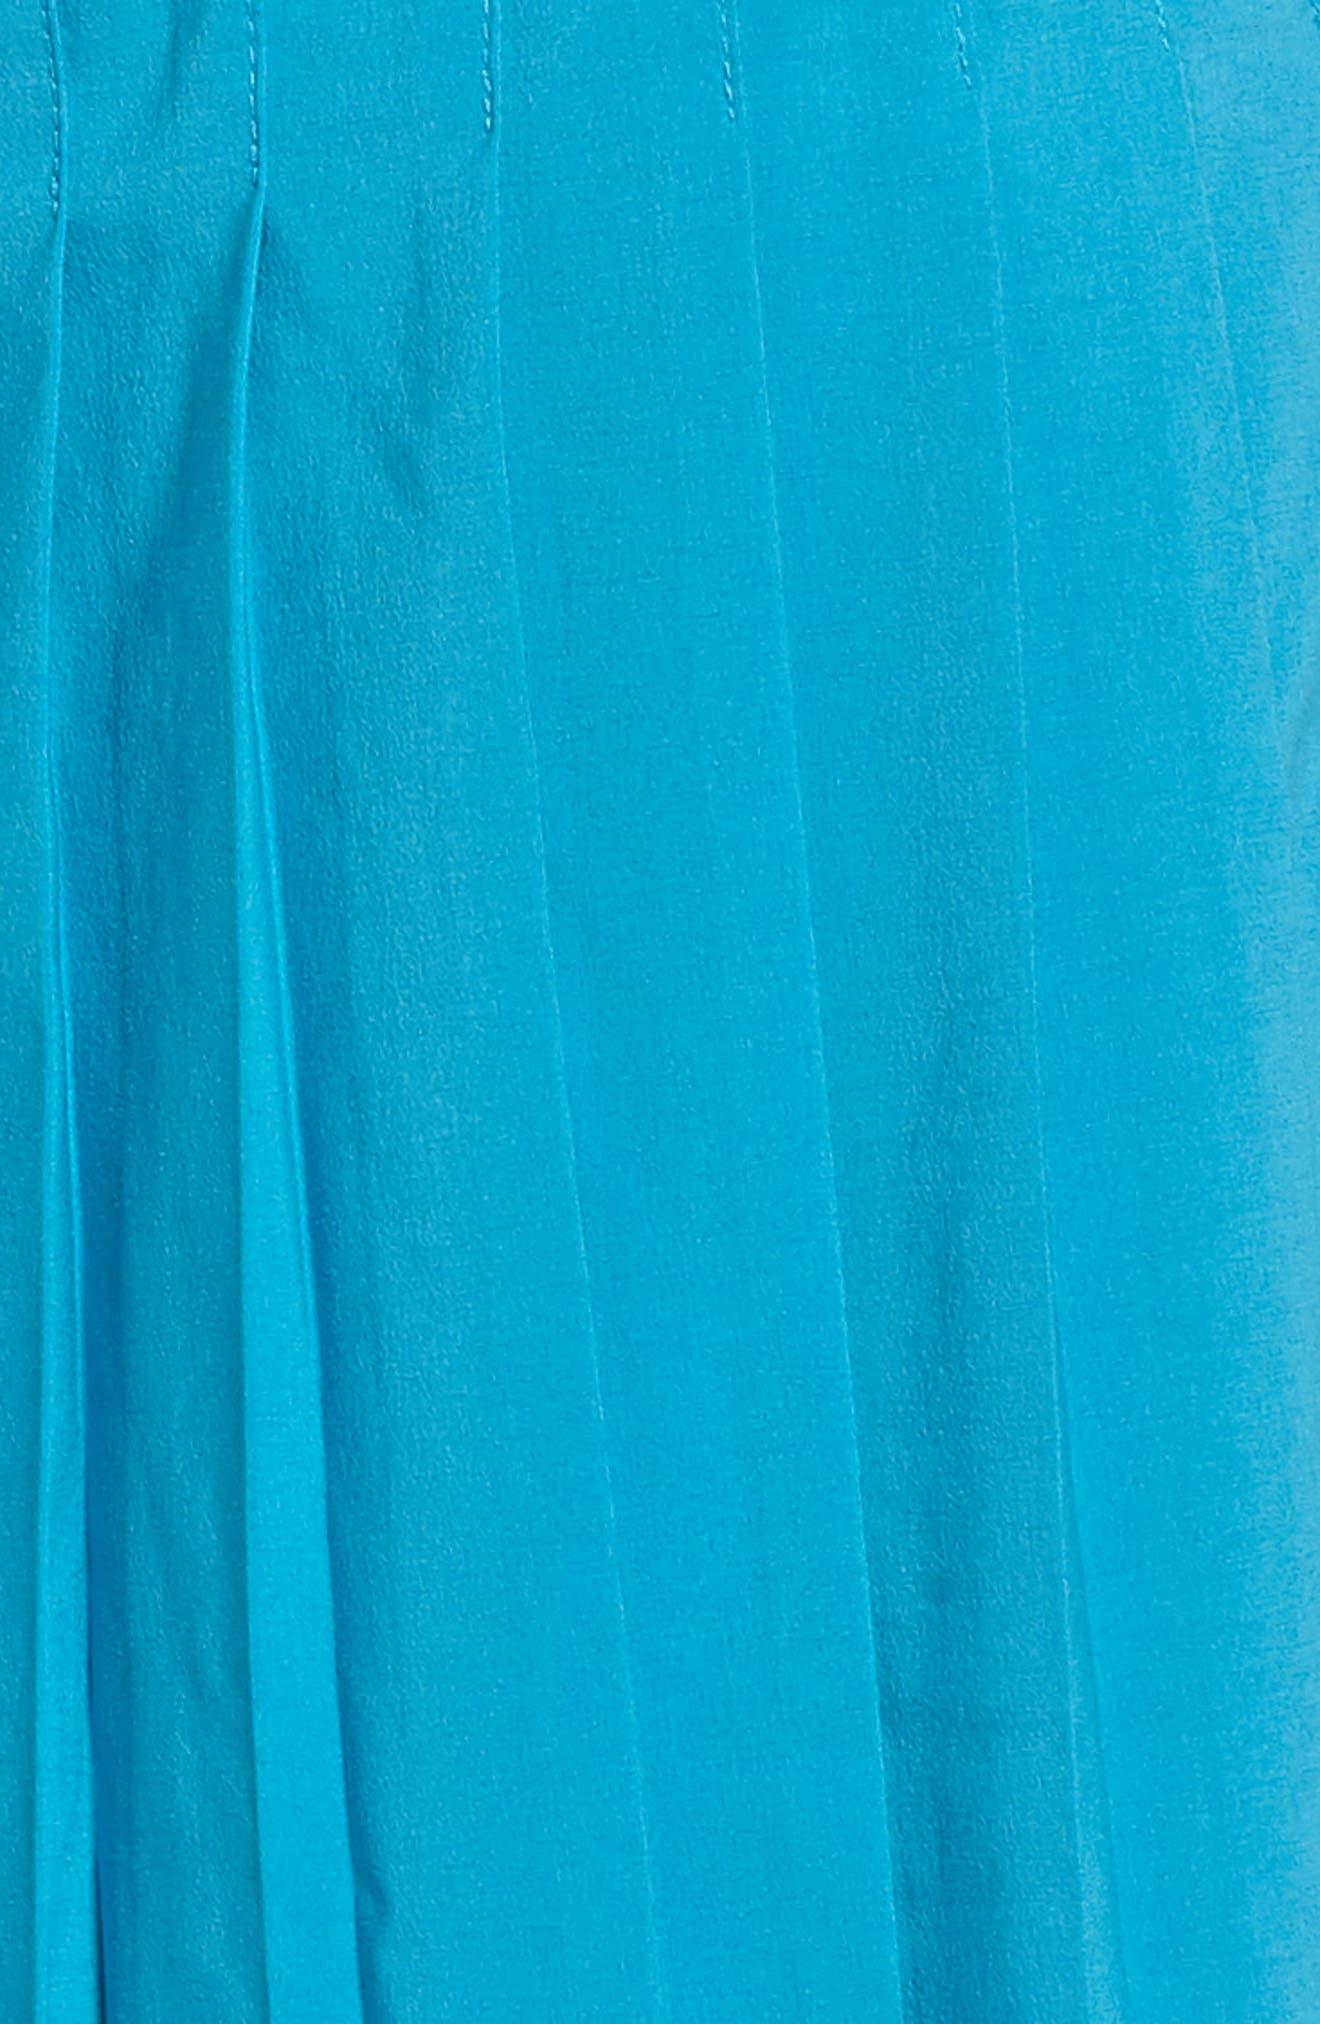 'Victory' Pleat Dri-FIT Tennis Skirt,                             Alternate thumbnail 6, color,                             Neo Turquoise/ Black